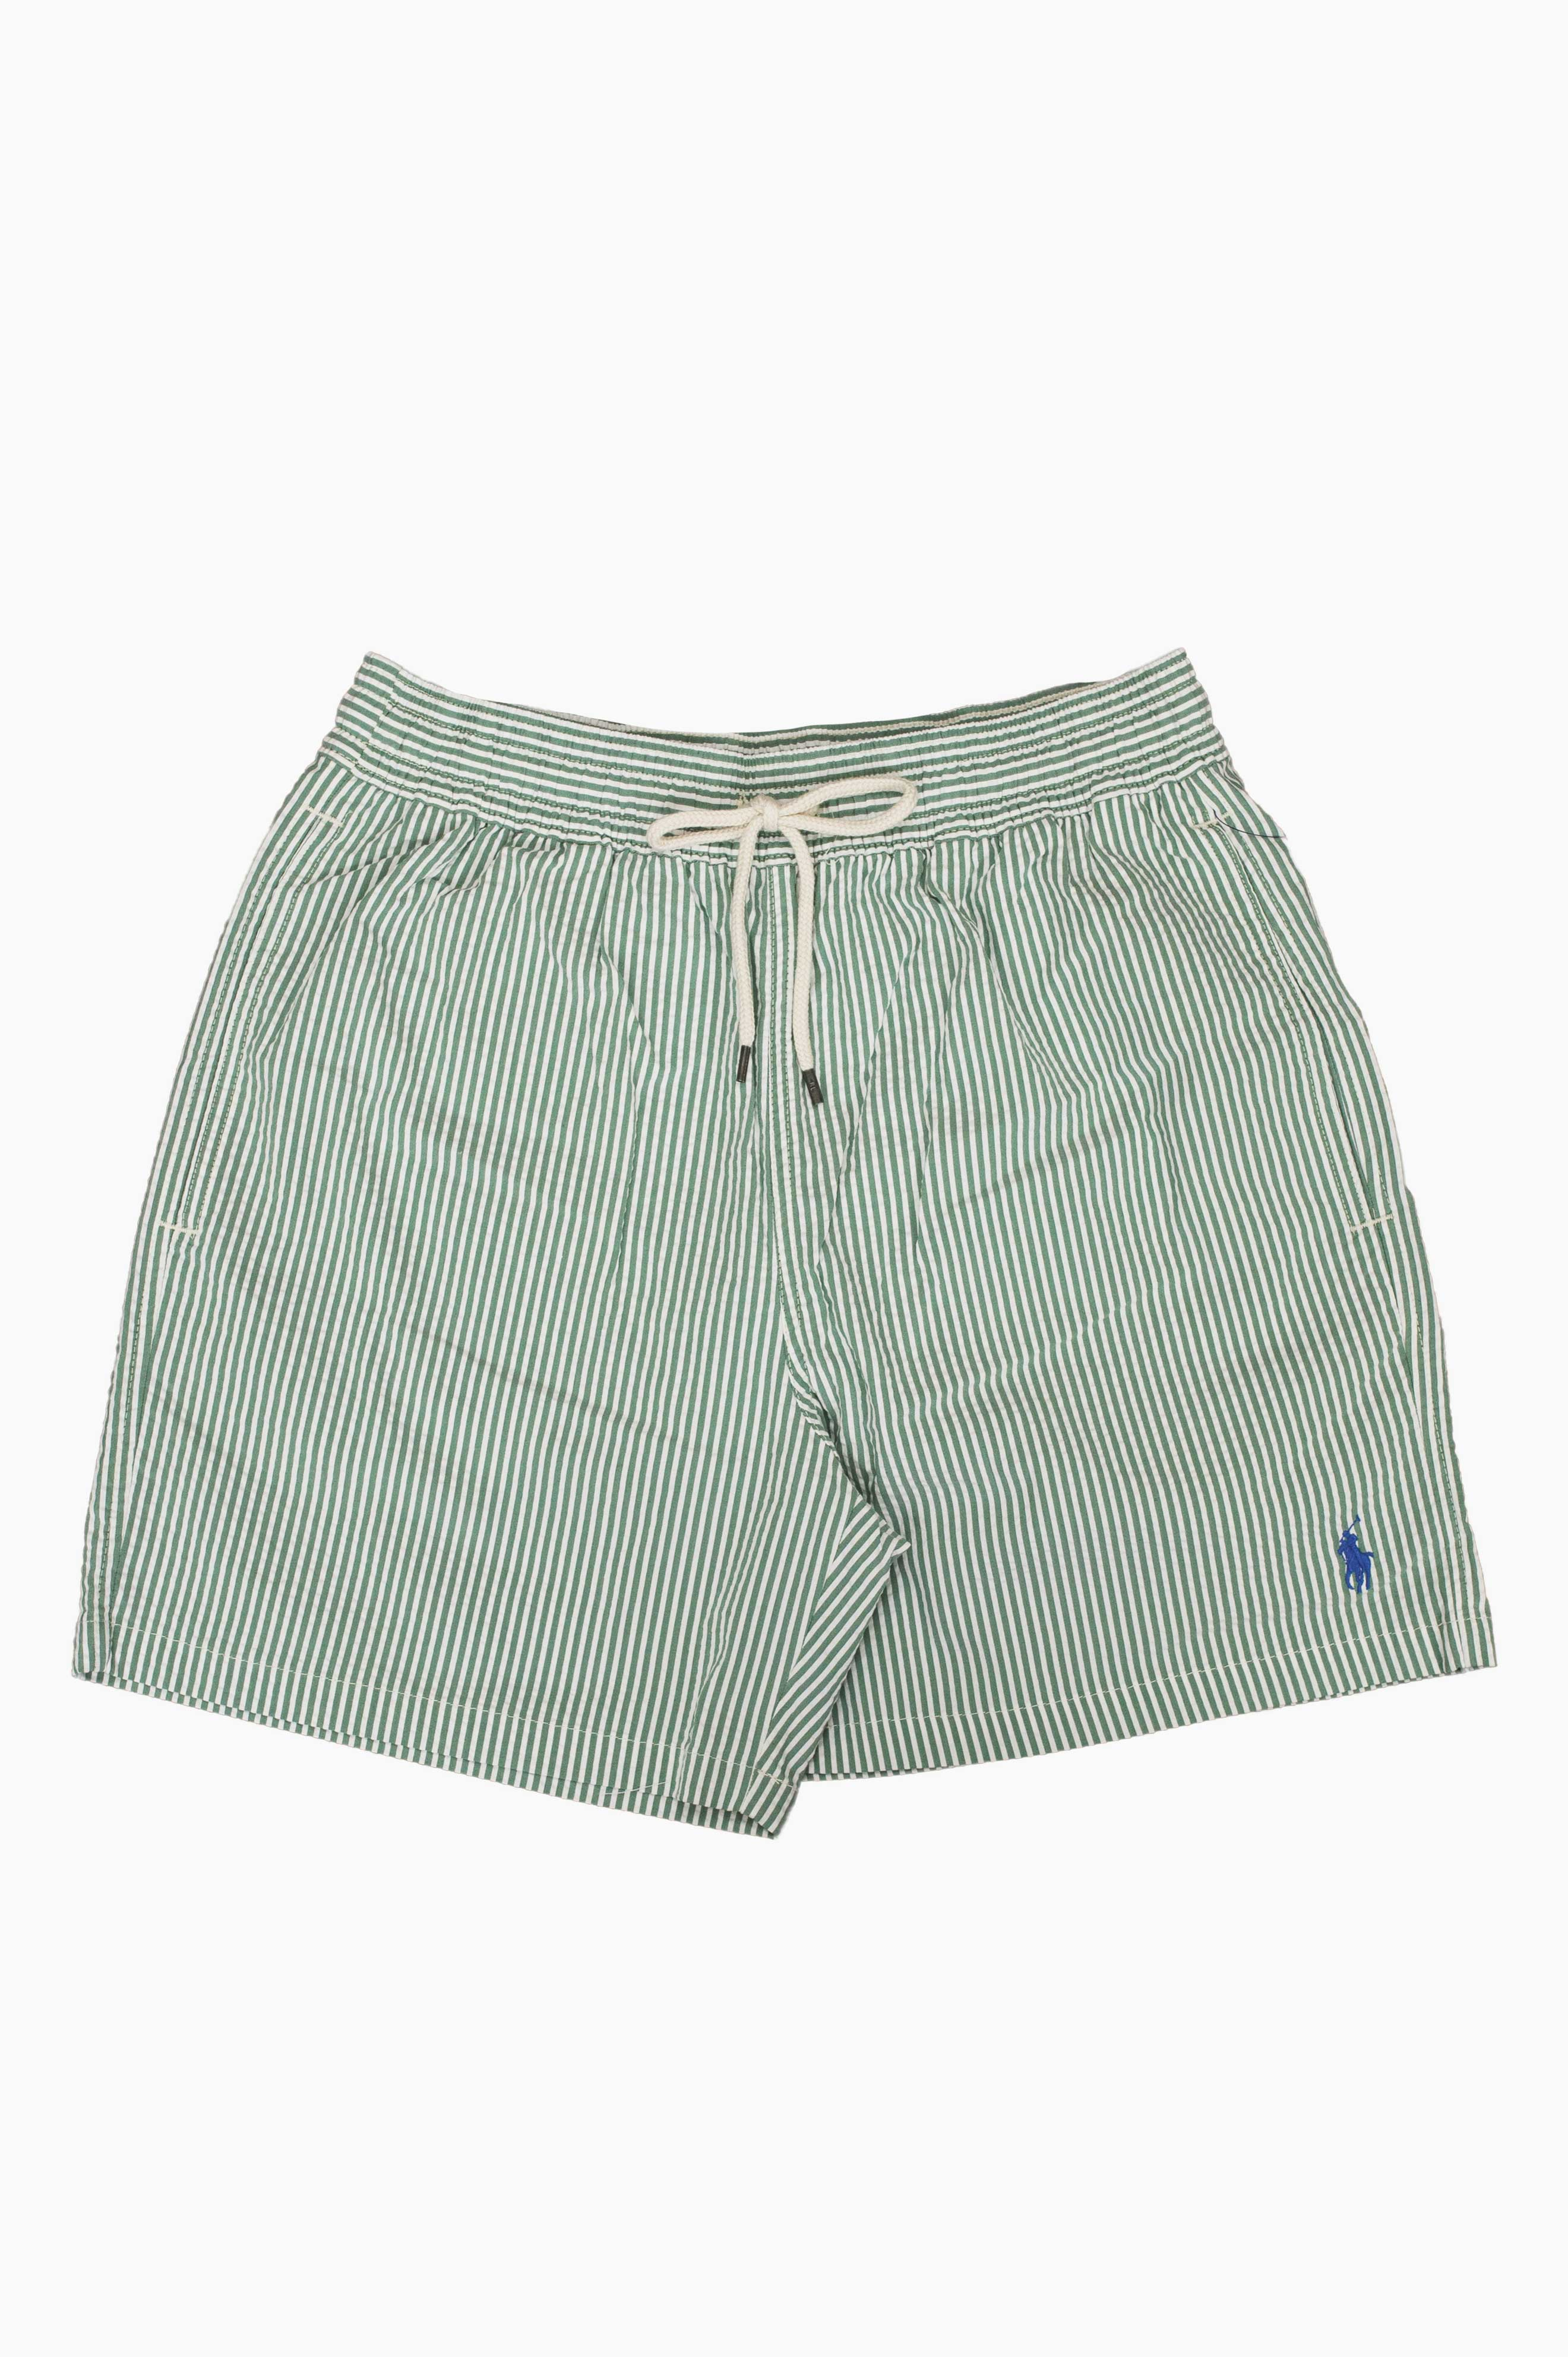 Traveler Seersucker Swim Shorts Green